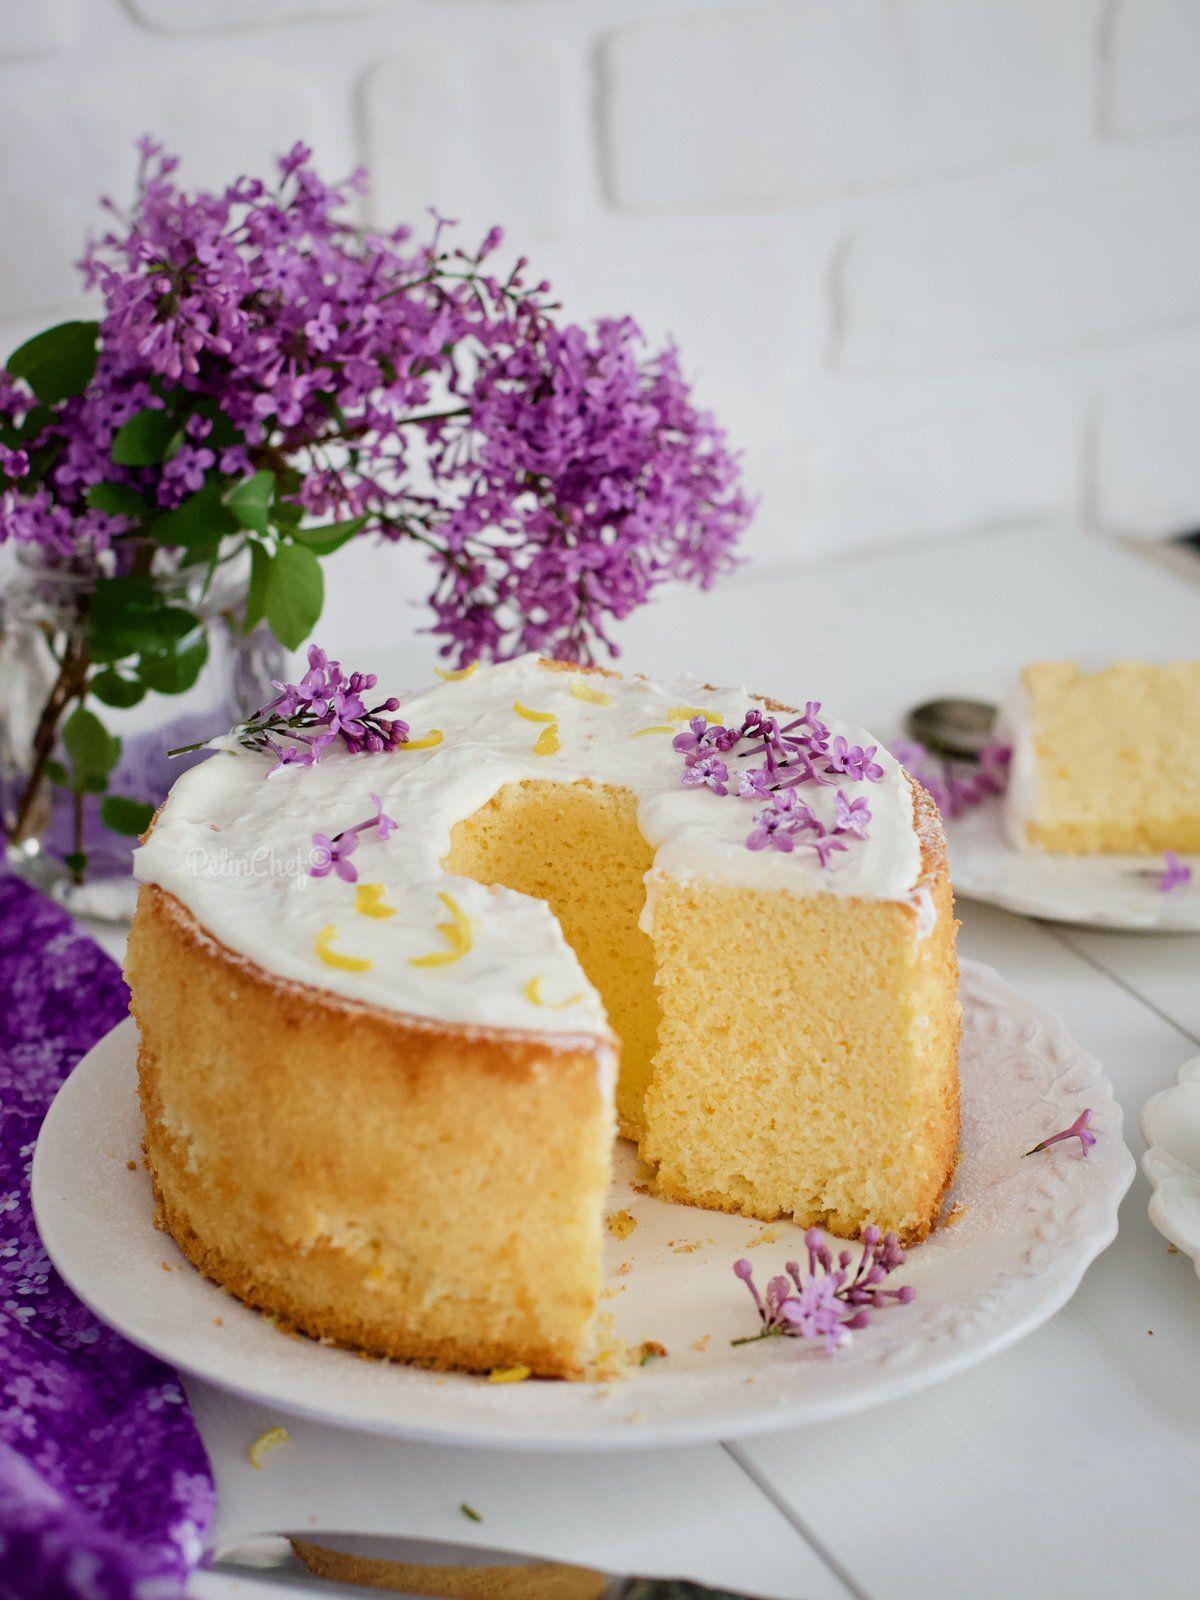 Limonlu Şifon Kek2